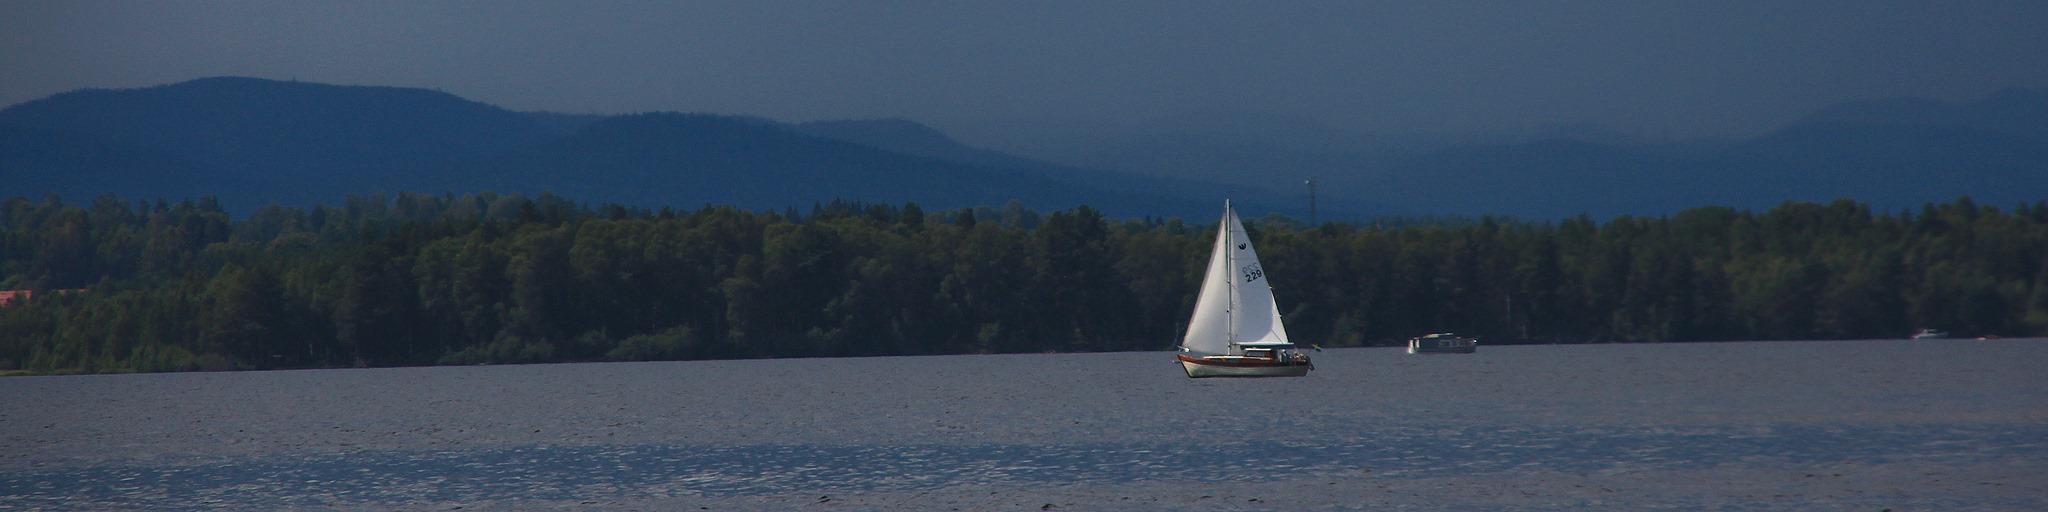 krister larsson segelbåt